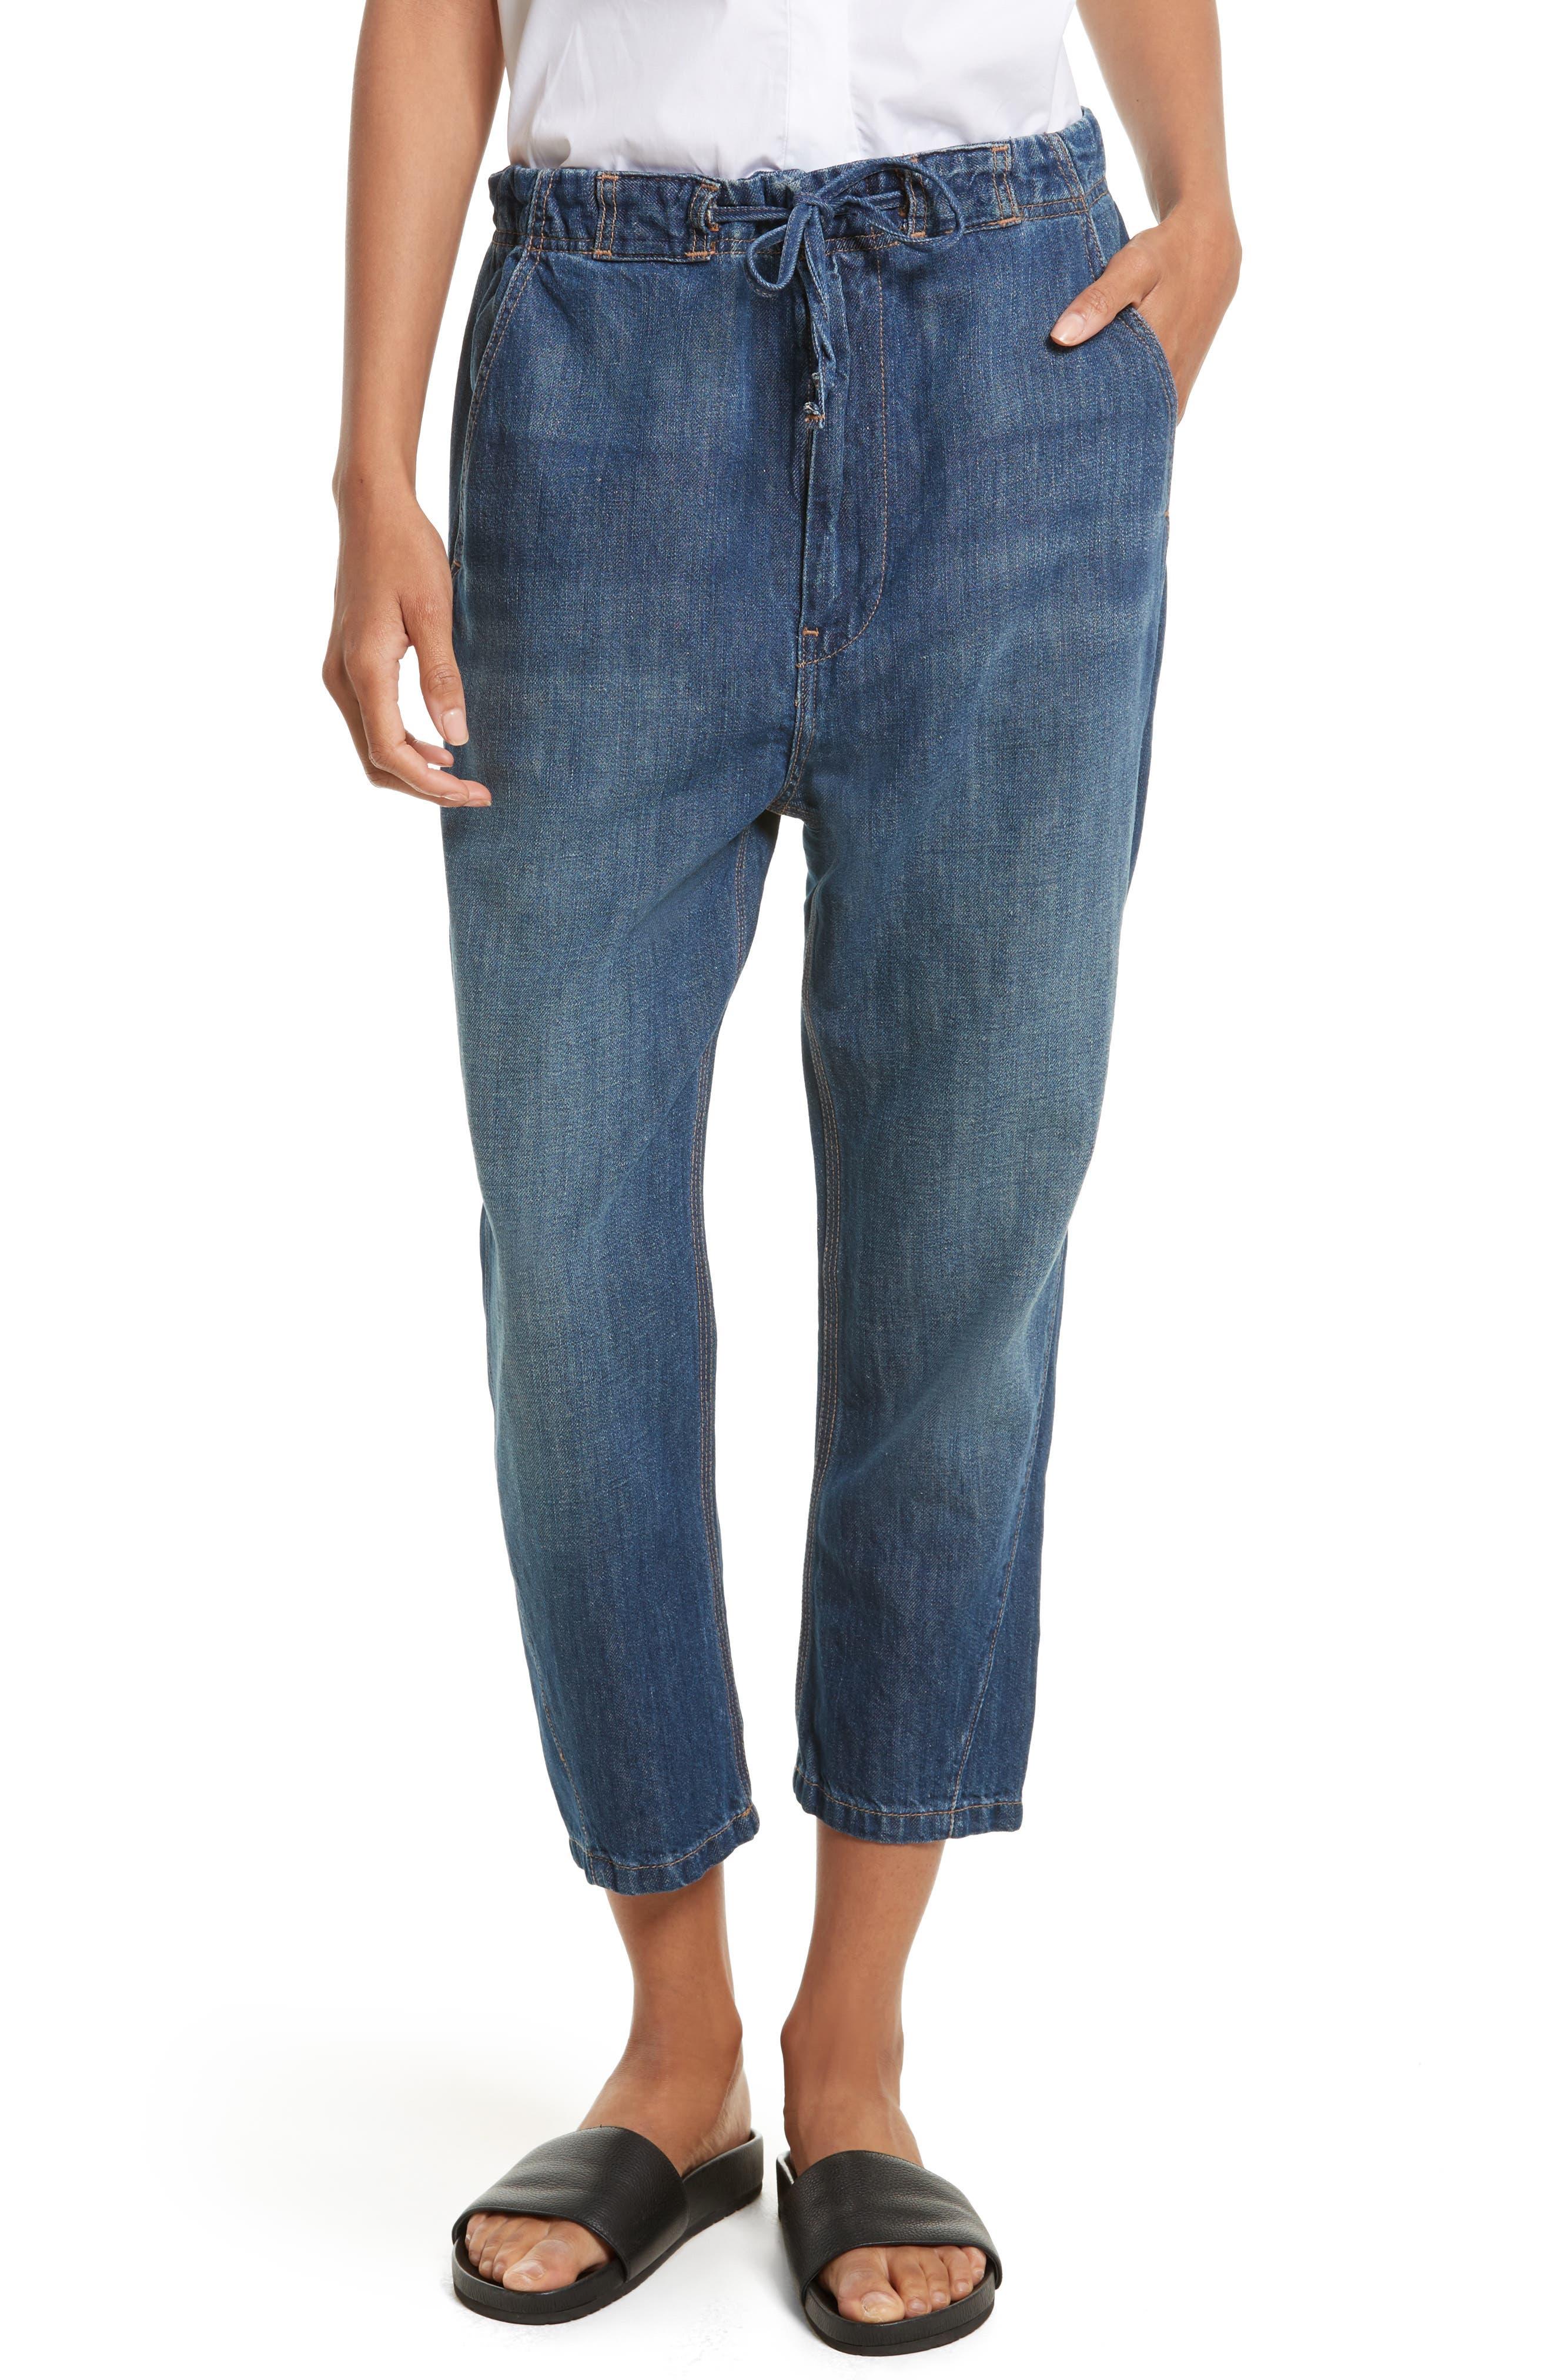 Cotton & Linen Denim Drawstring Workwear Trousers,                         Main,                         color, Light Wash